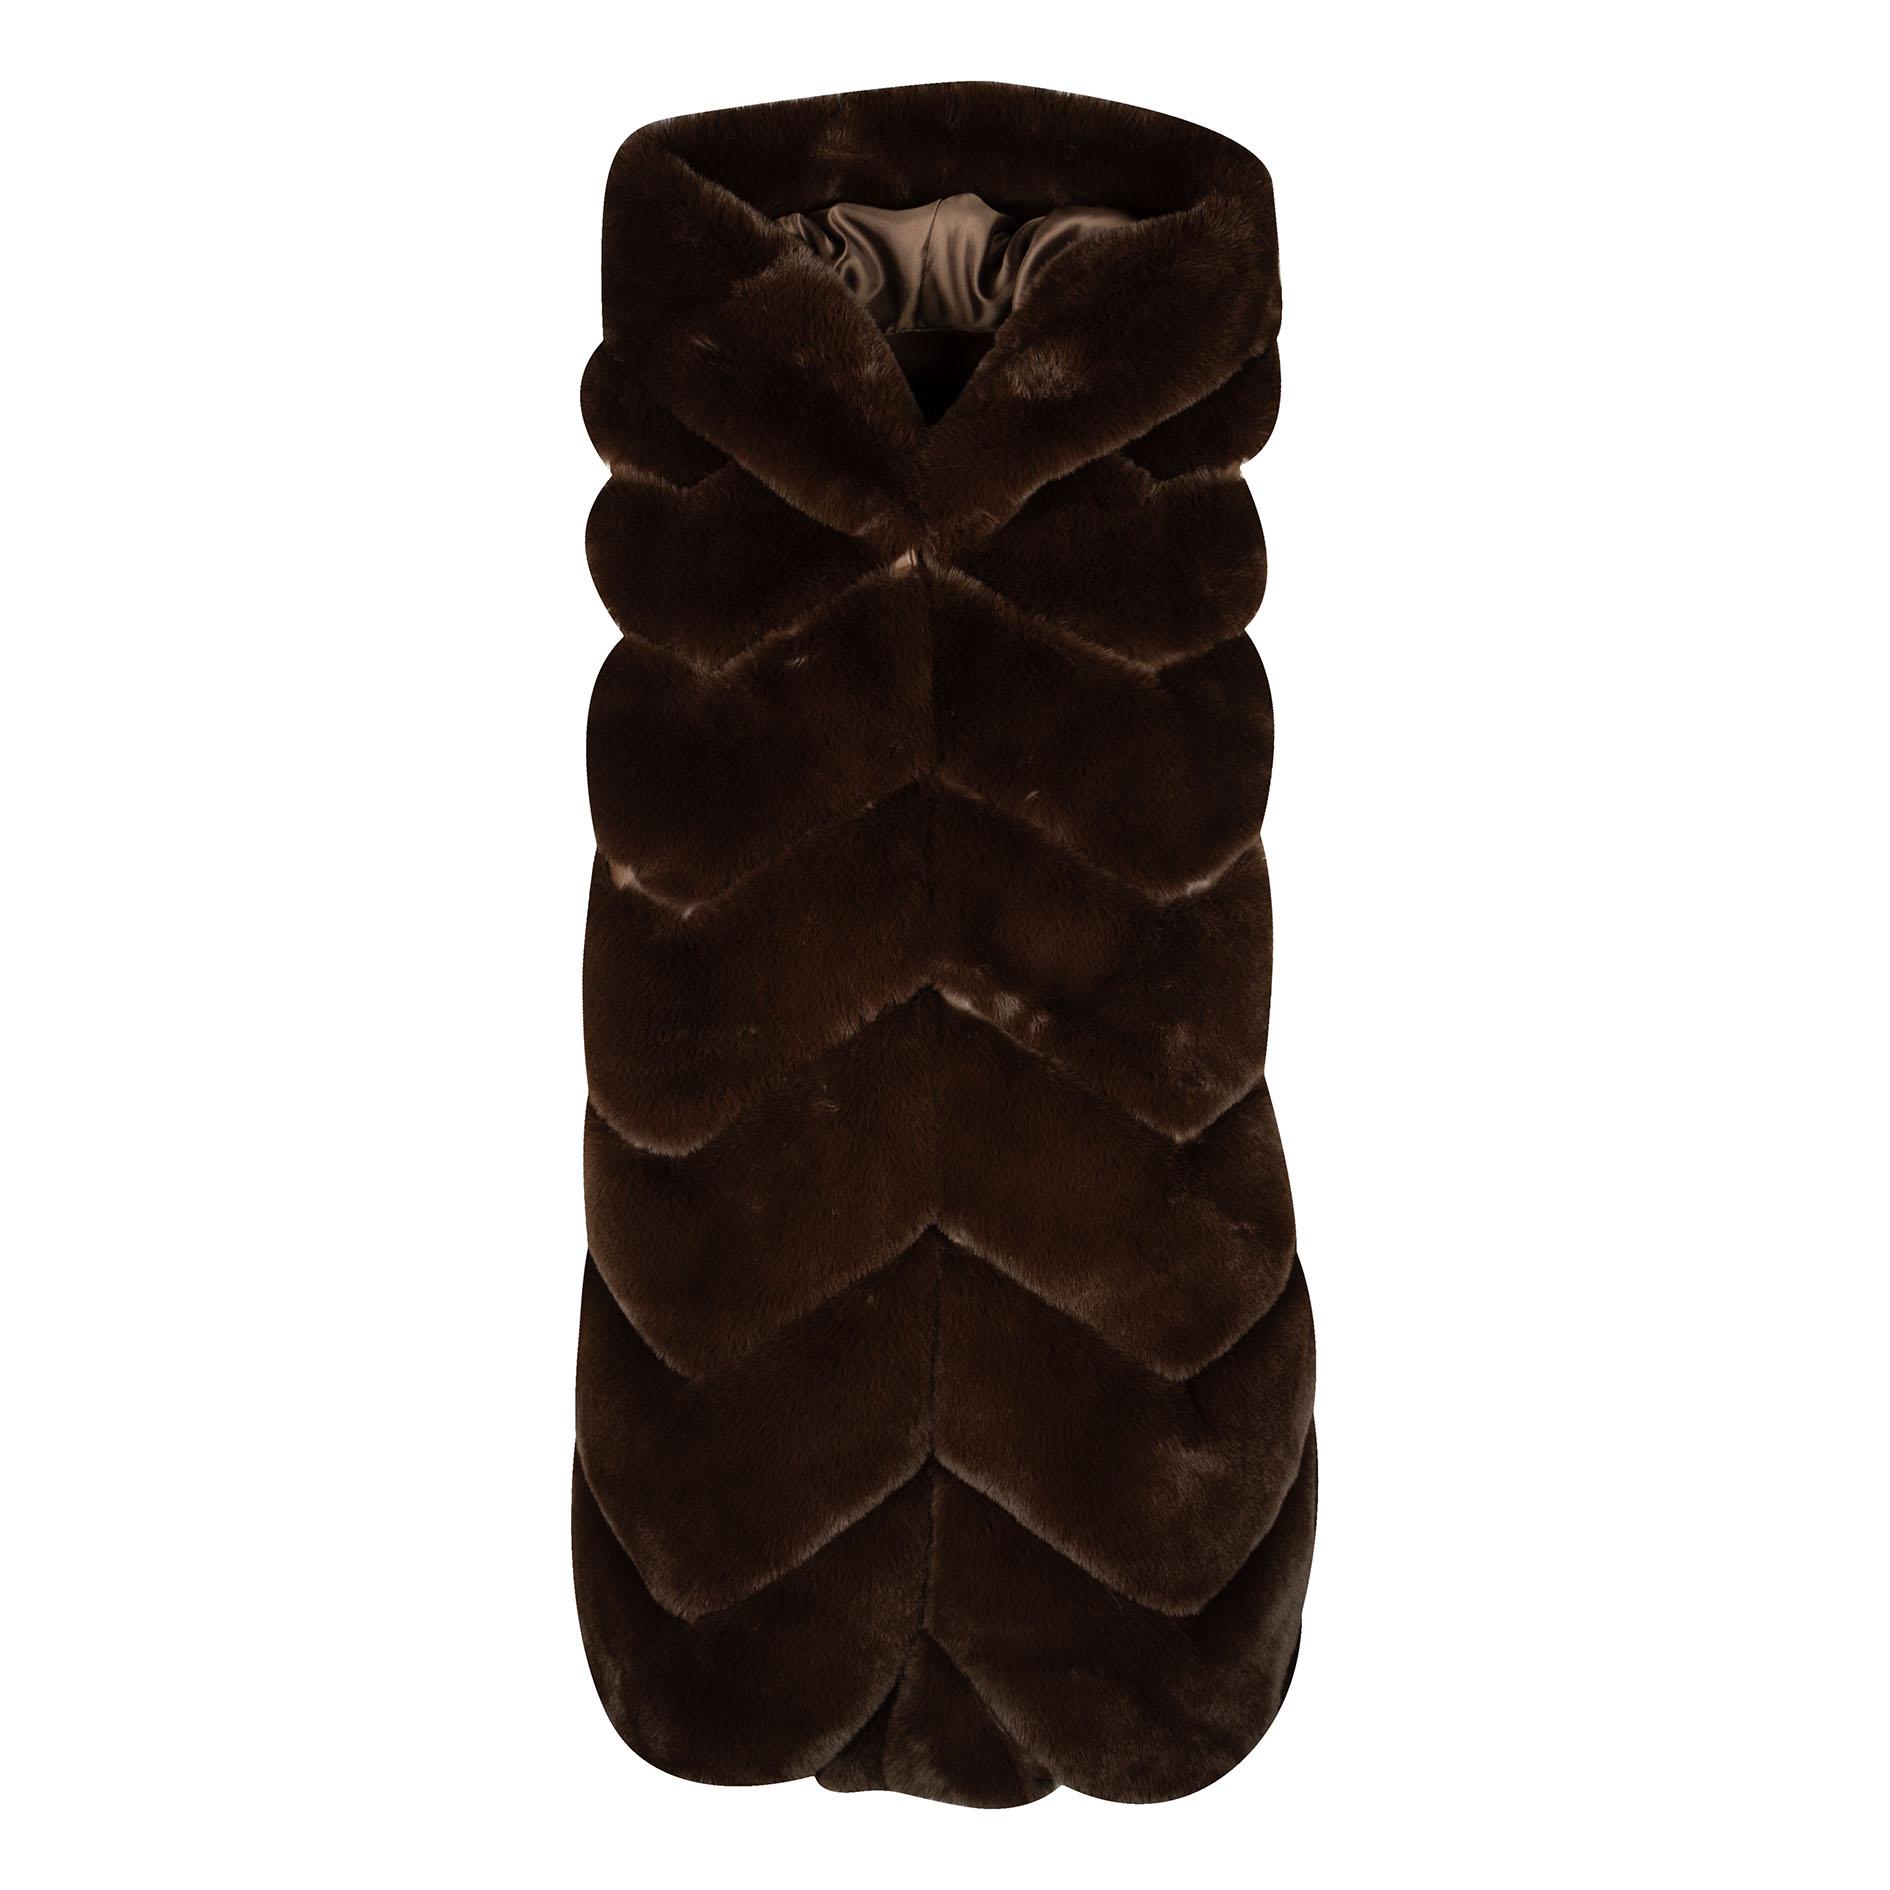 Pels 'Urmond' Chocolate